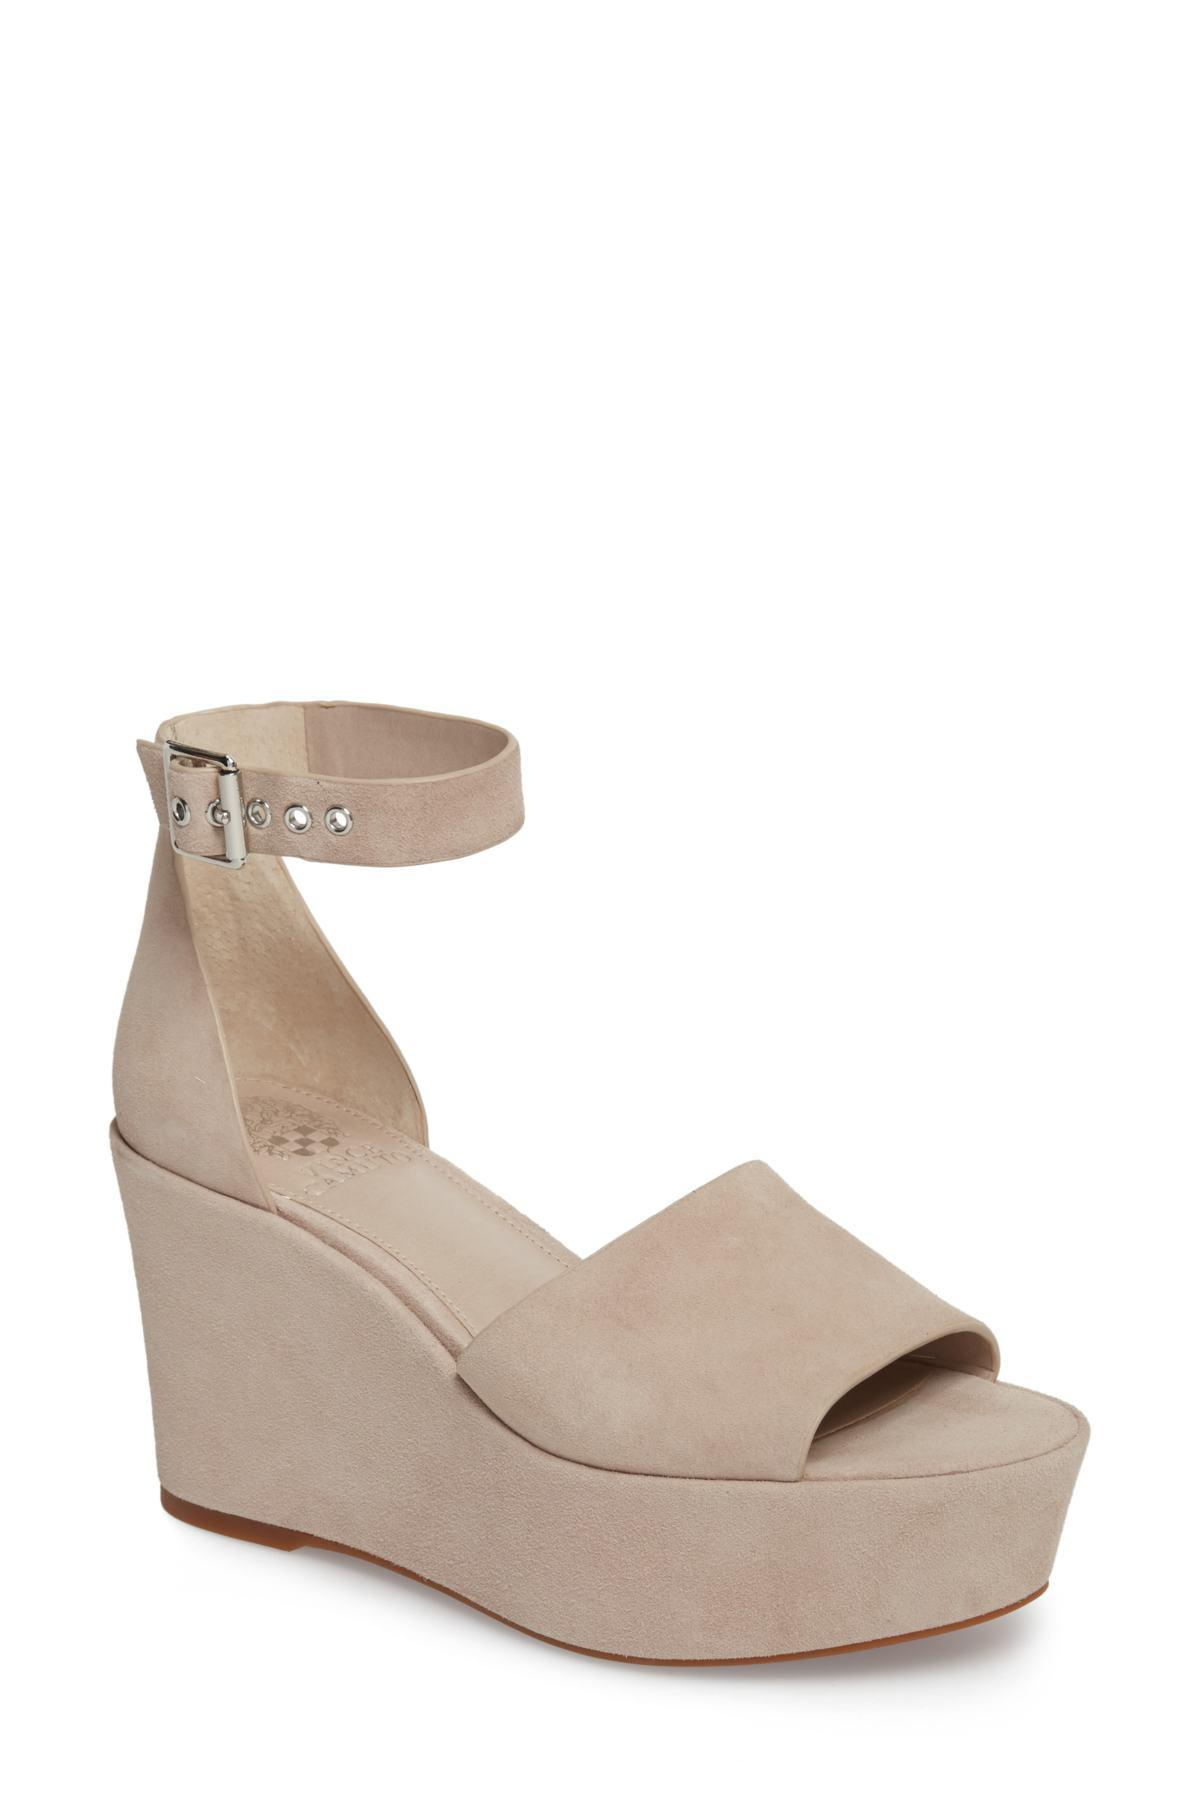 1d9396f9480 Lyst - Vince Camuto Korista Platform Sandal - Save 10.389610389610397%